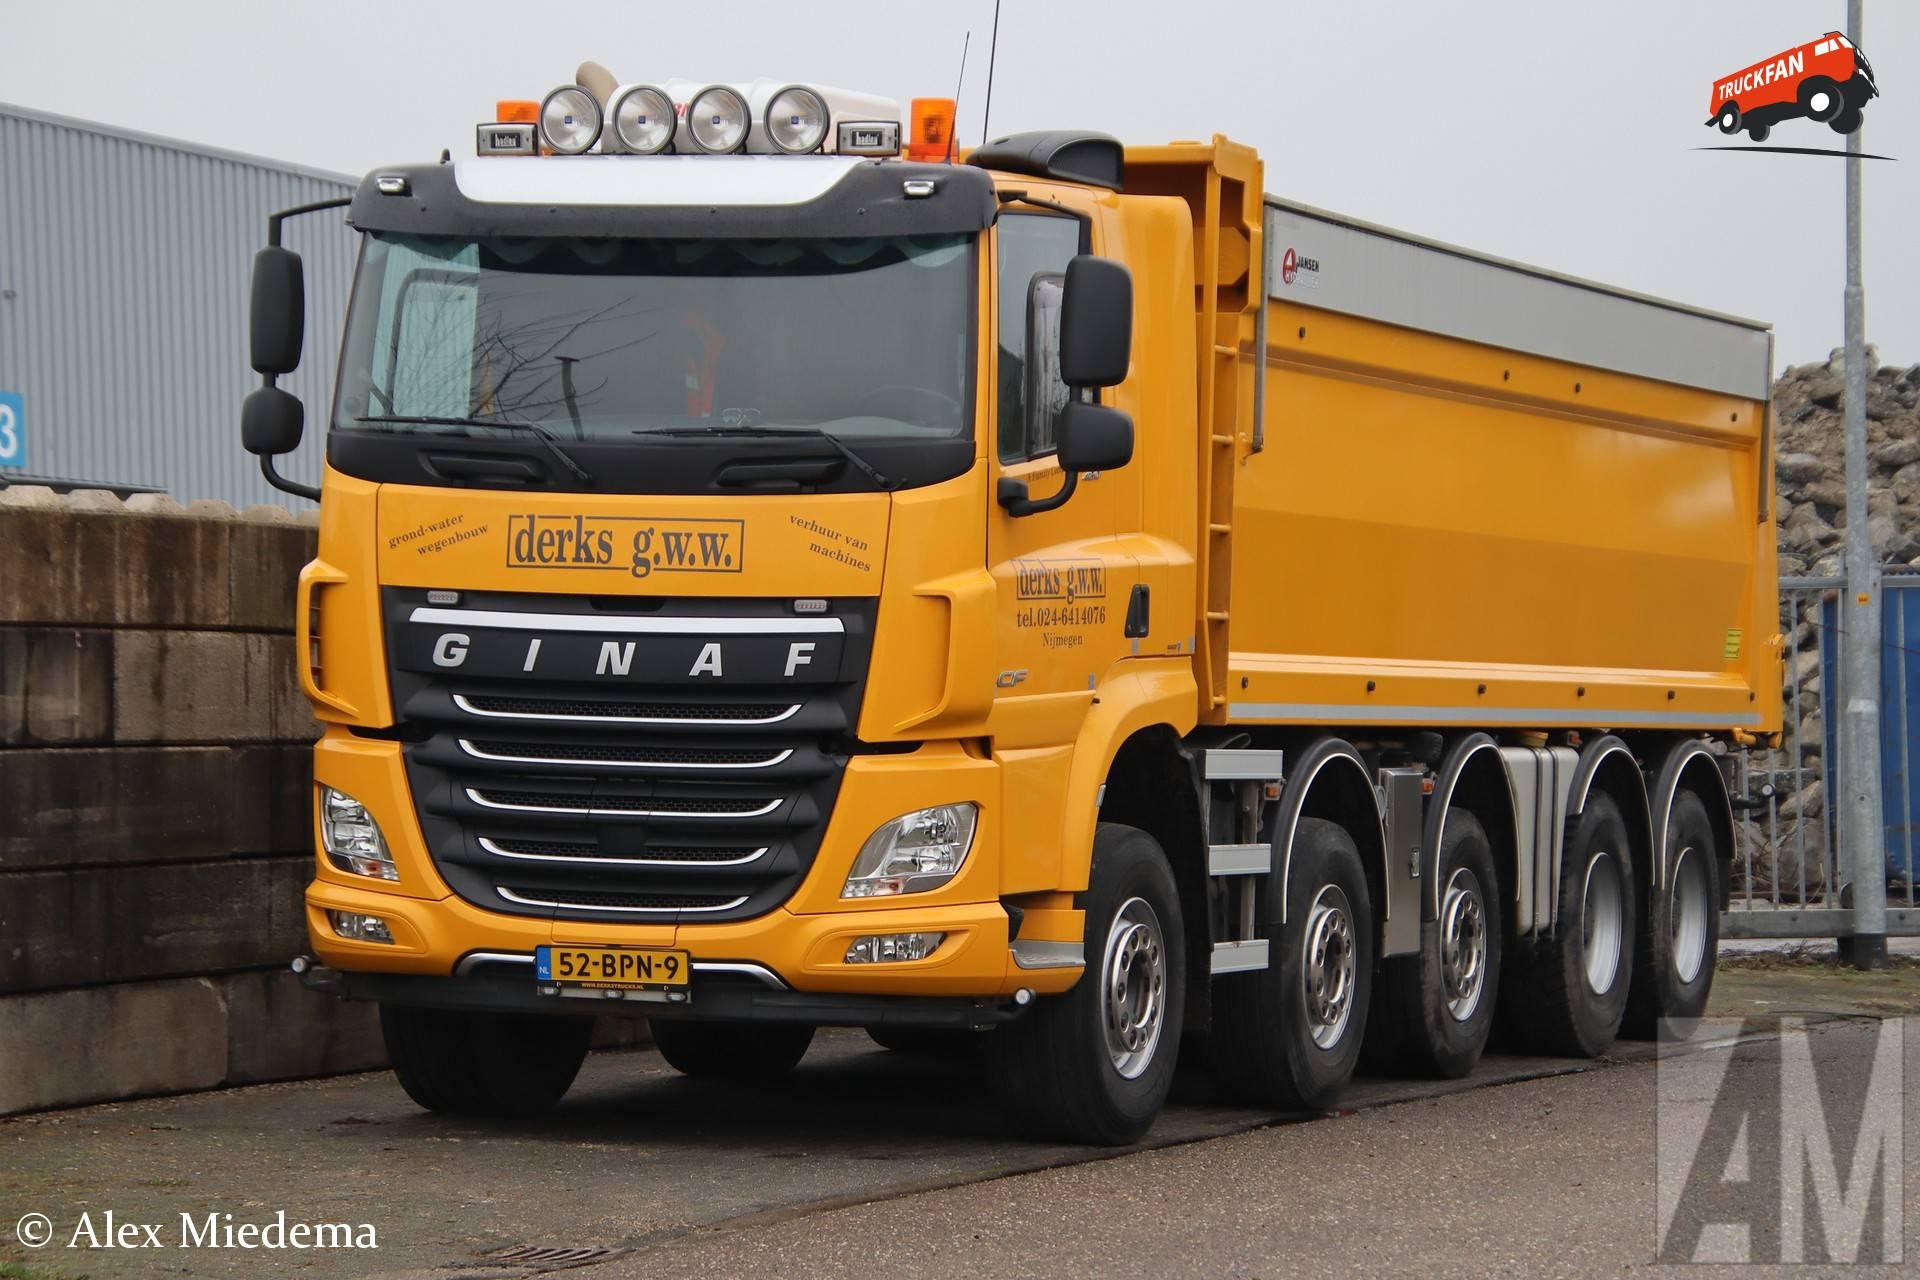 GINAF X6 5249-CE